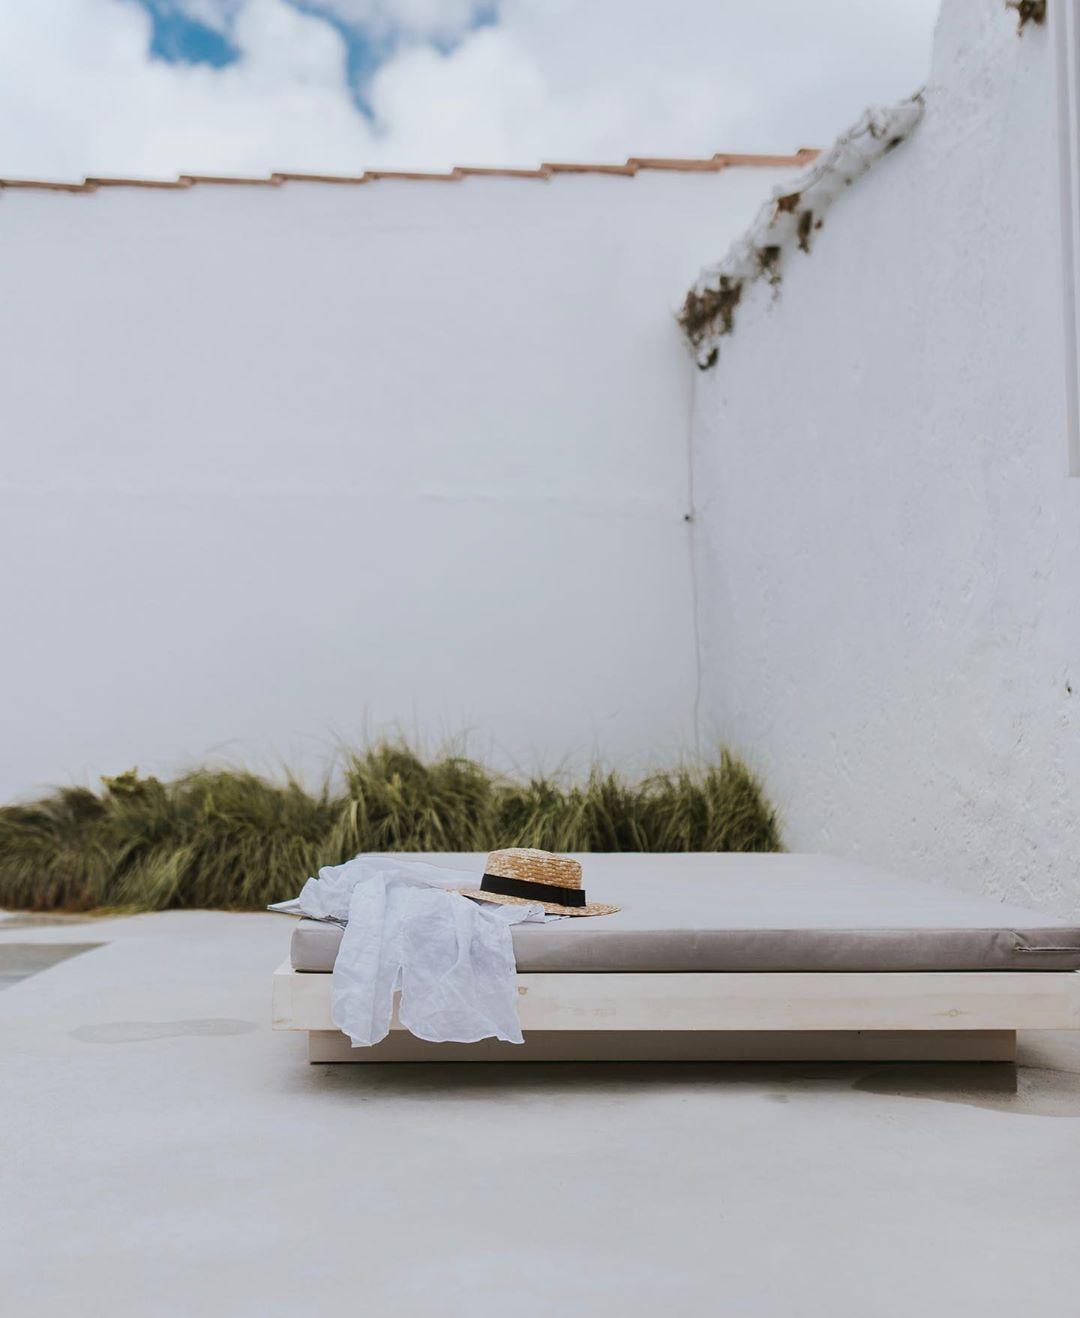 Slow Living: 38 φωτογραφίες από ένα κατάλευκο οίκημα στη Λισαβόνα